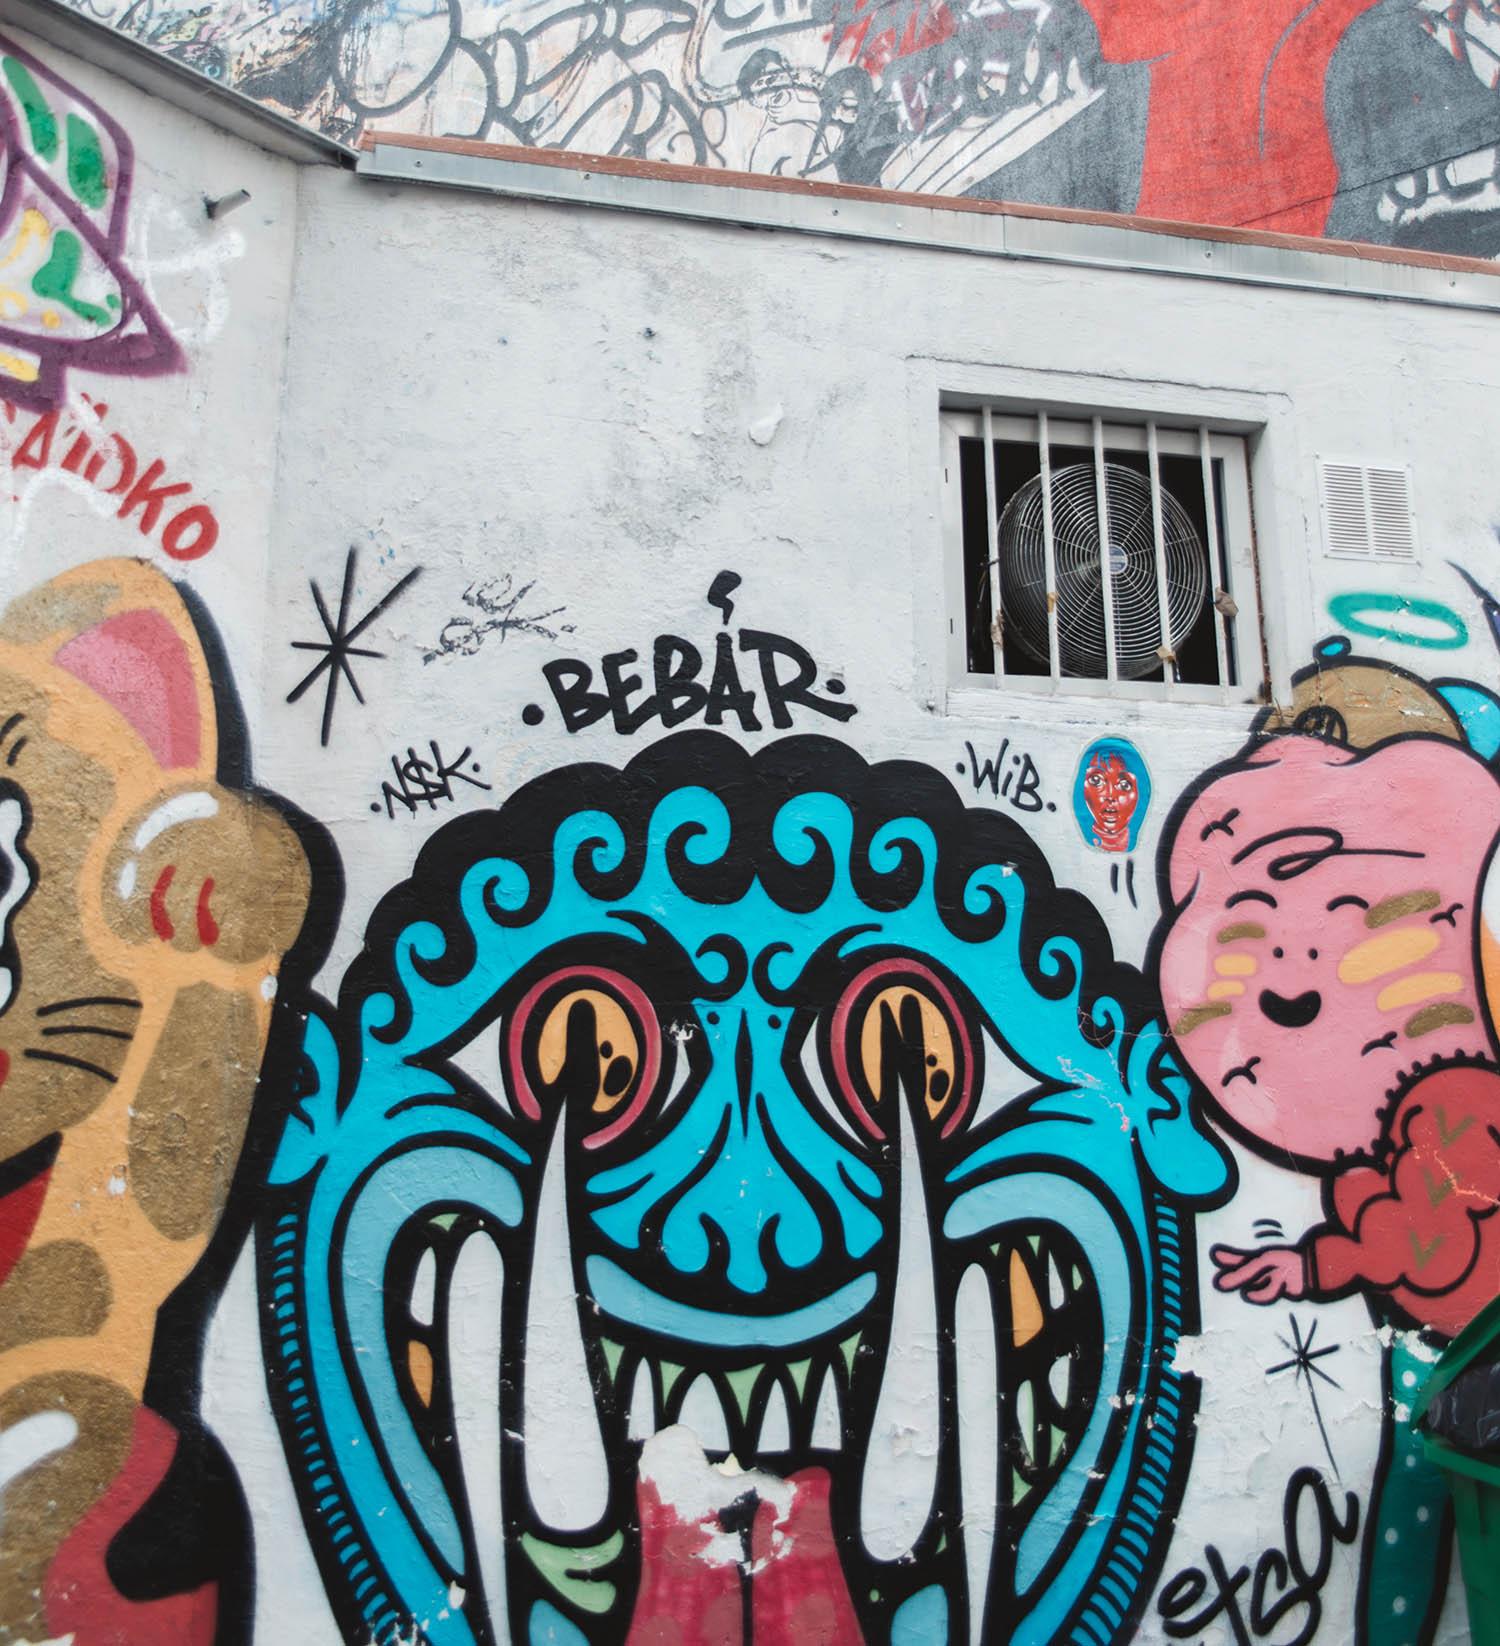 Street art in Paris 13th arrondissement